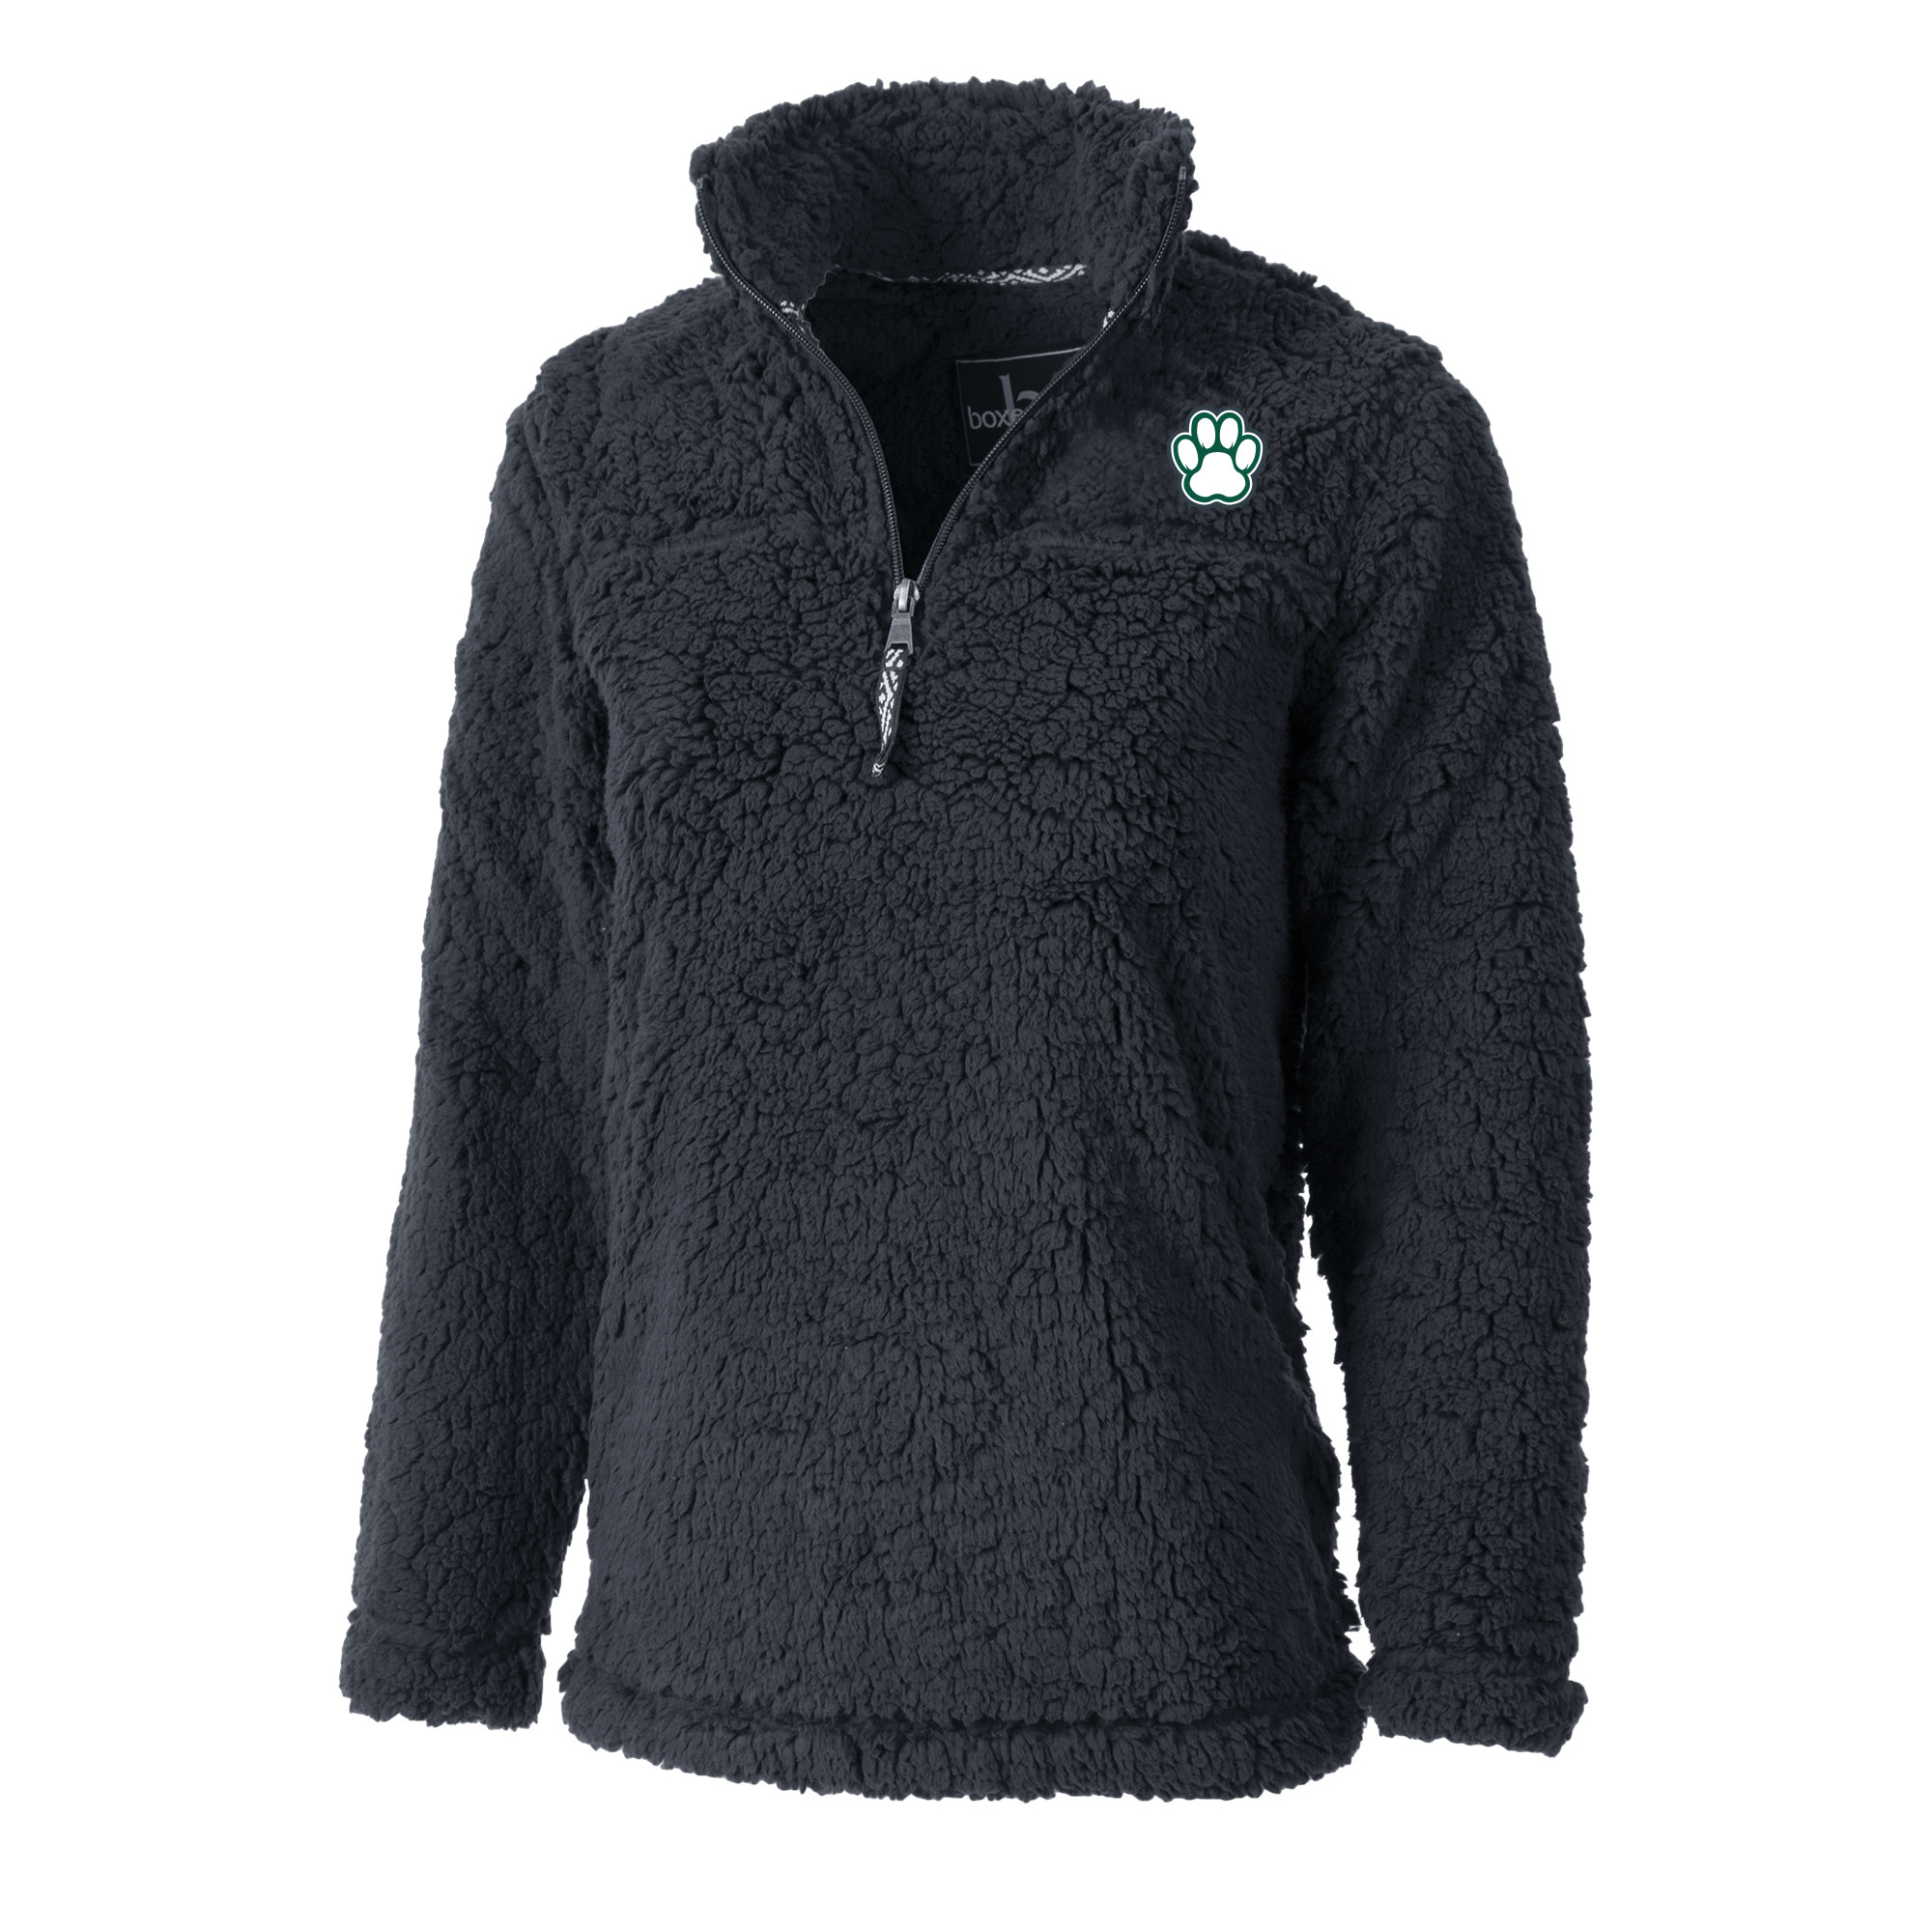 Boxercraft Pullover: Sherpa 1/4 Zip